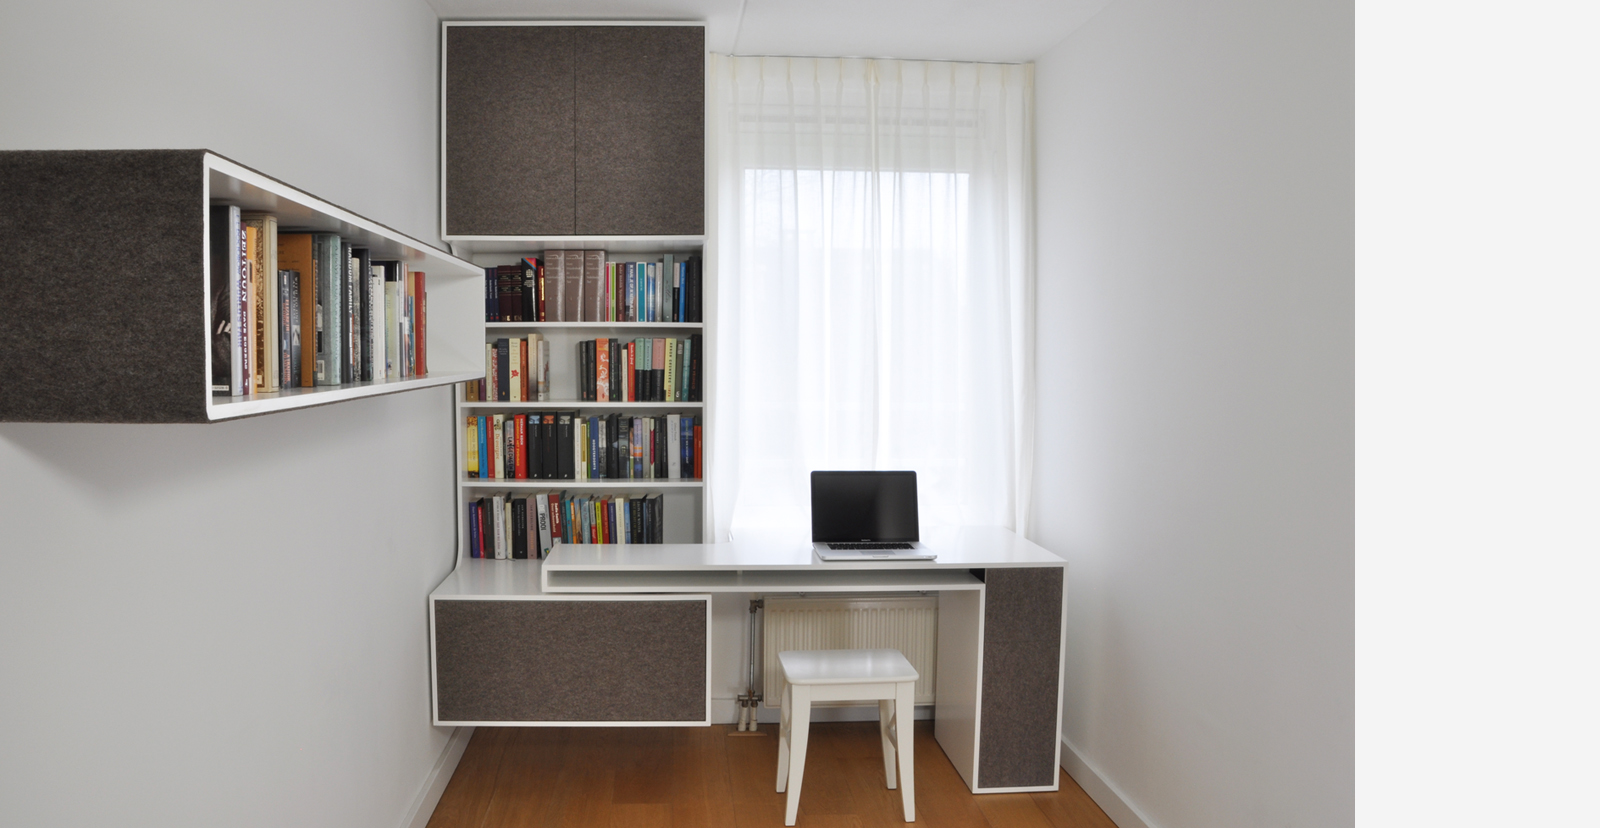 Thomas durner works kleine ruimte groot for Meubels voor kleine ruimtes